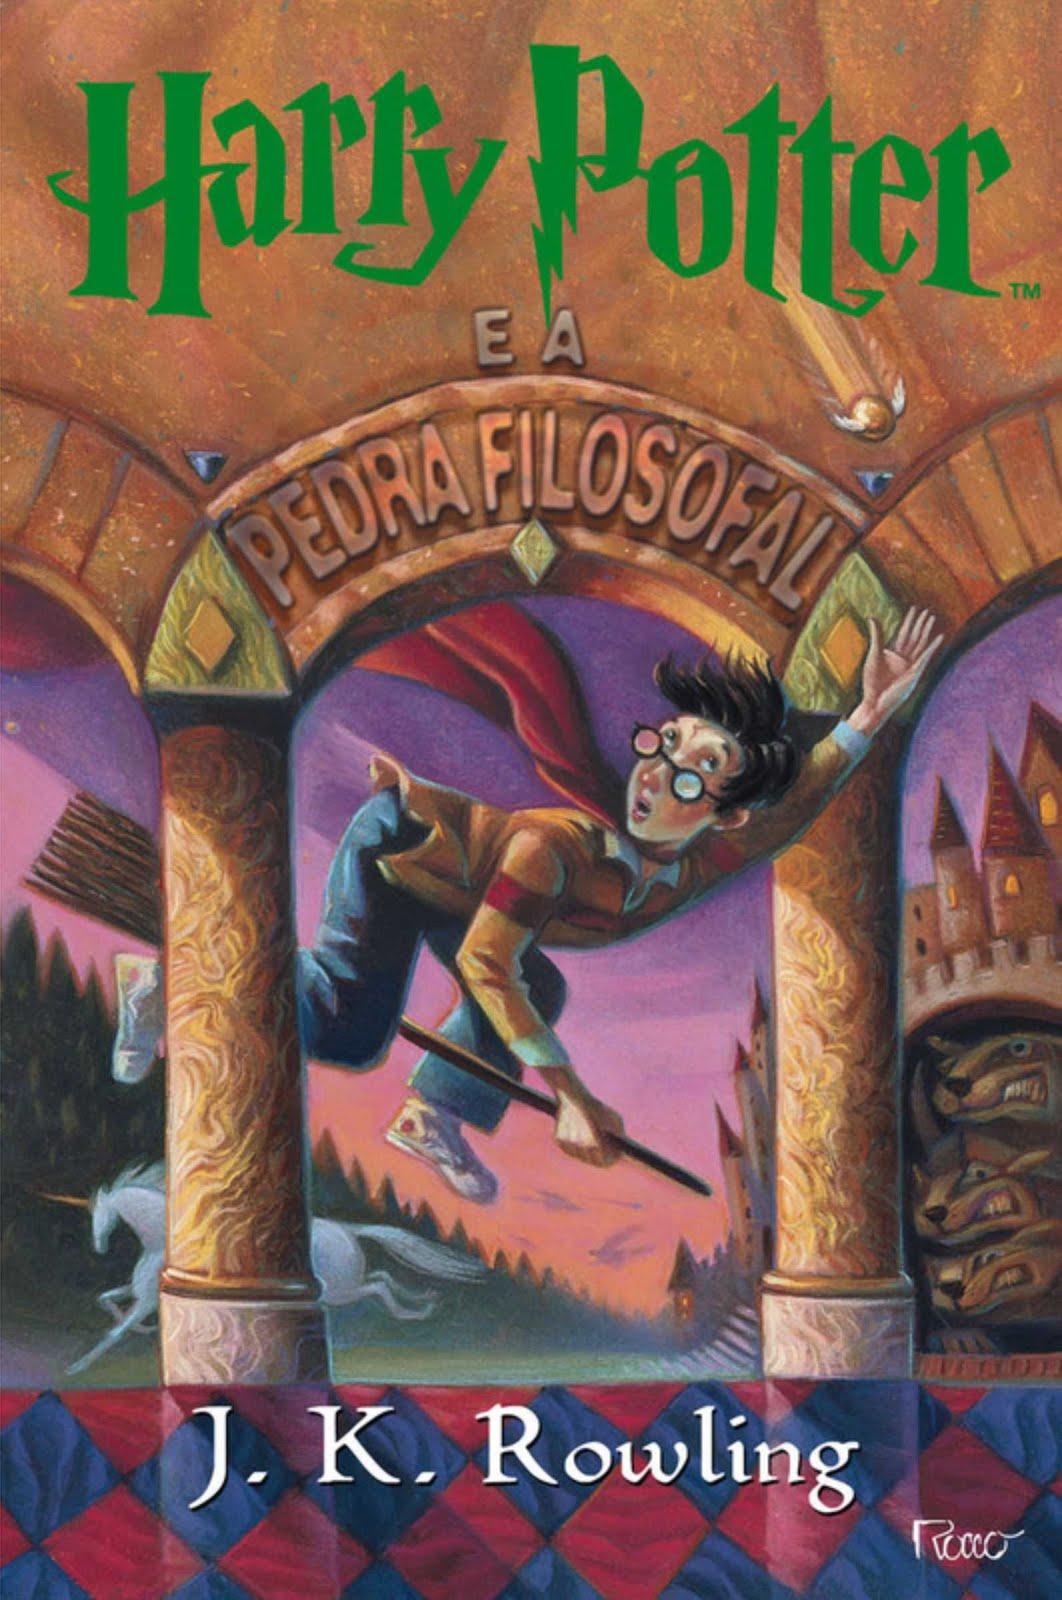 Potterish.com [Year 18] :: Harry Potter, The Ickabog, Fantastic Beasts, JK Rowling, Daniel, Emma & Rupert Harry Potter's logo came up by chance